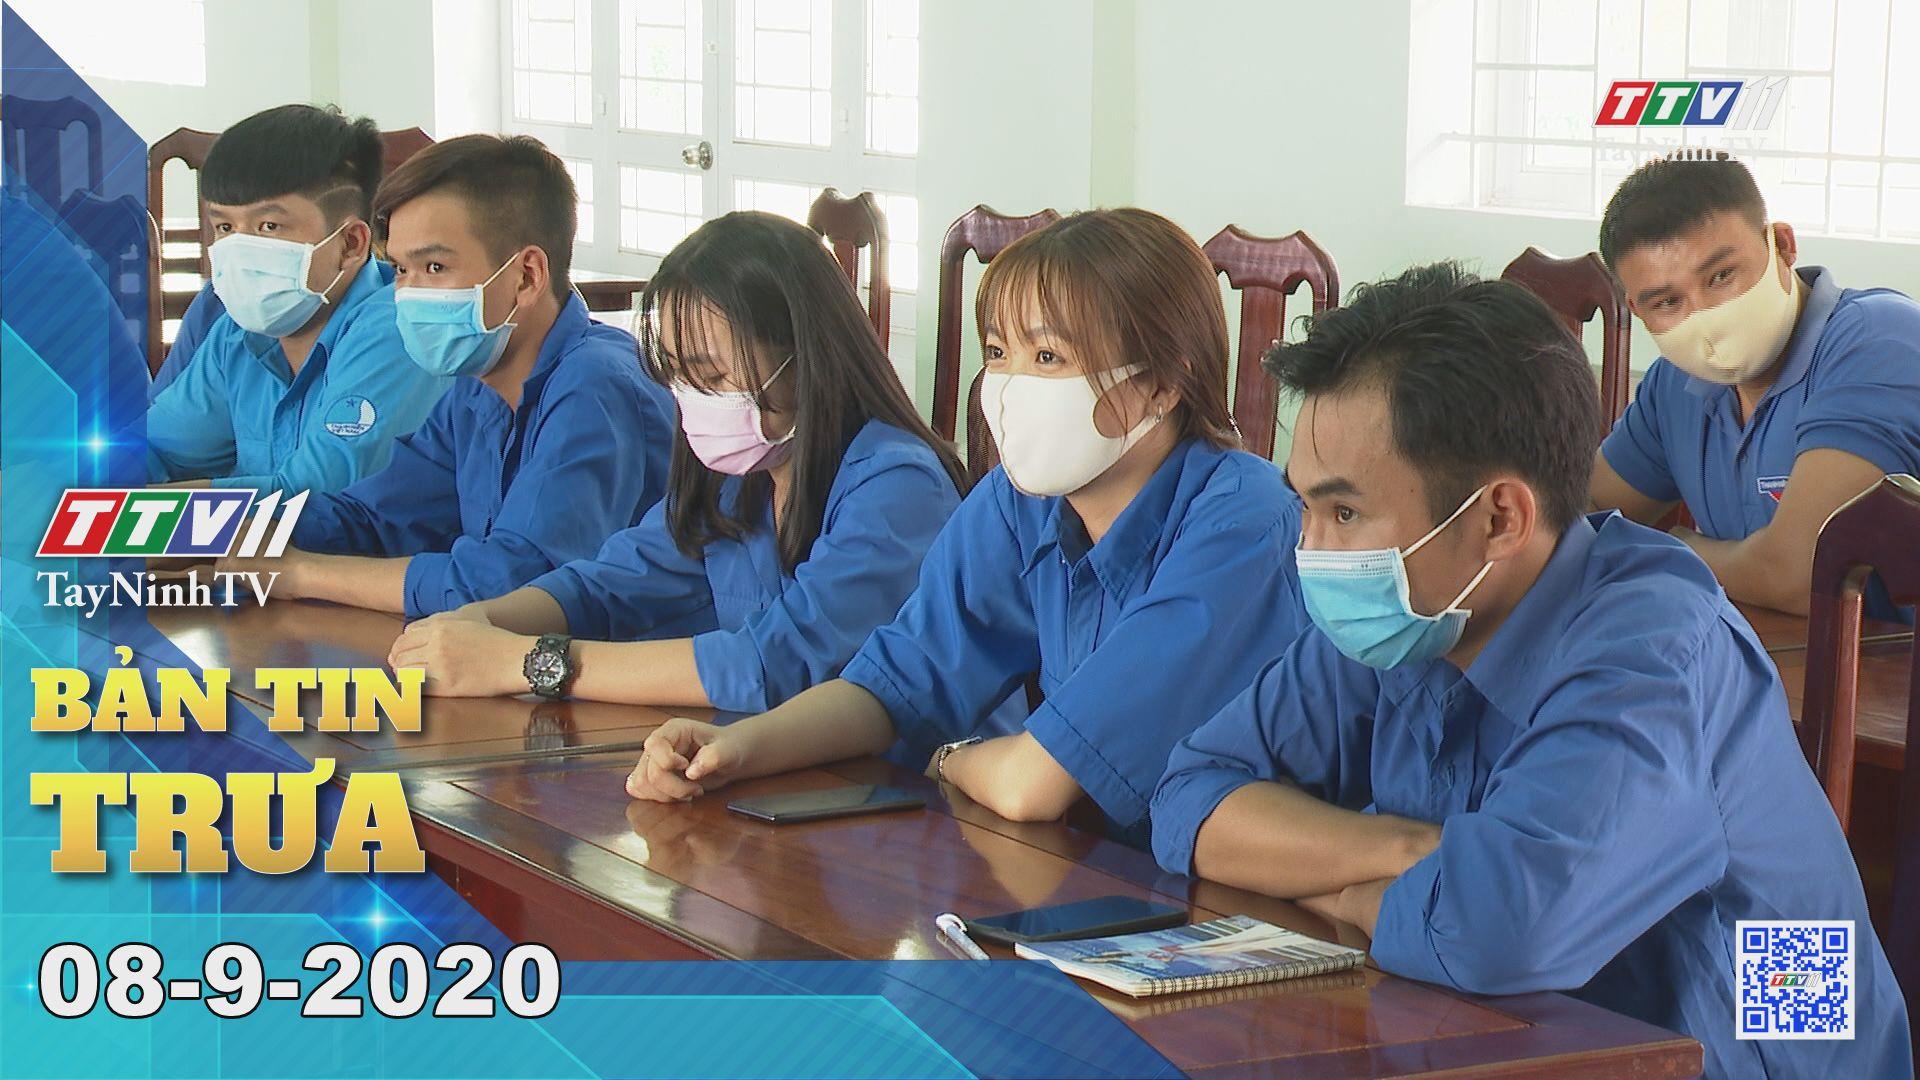 Bản tin trưa 08-9-2020 | Tin tức hôm nay | TayNinhTV